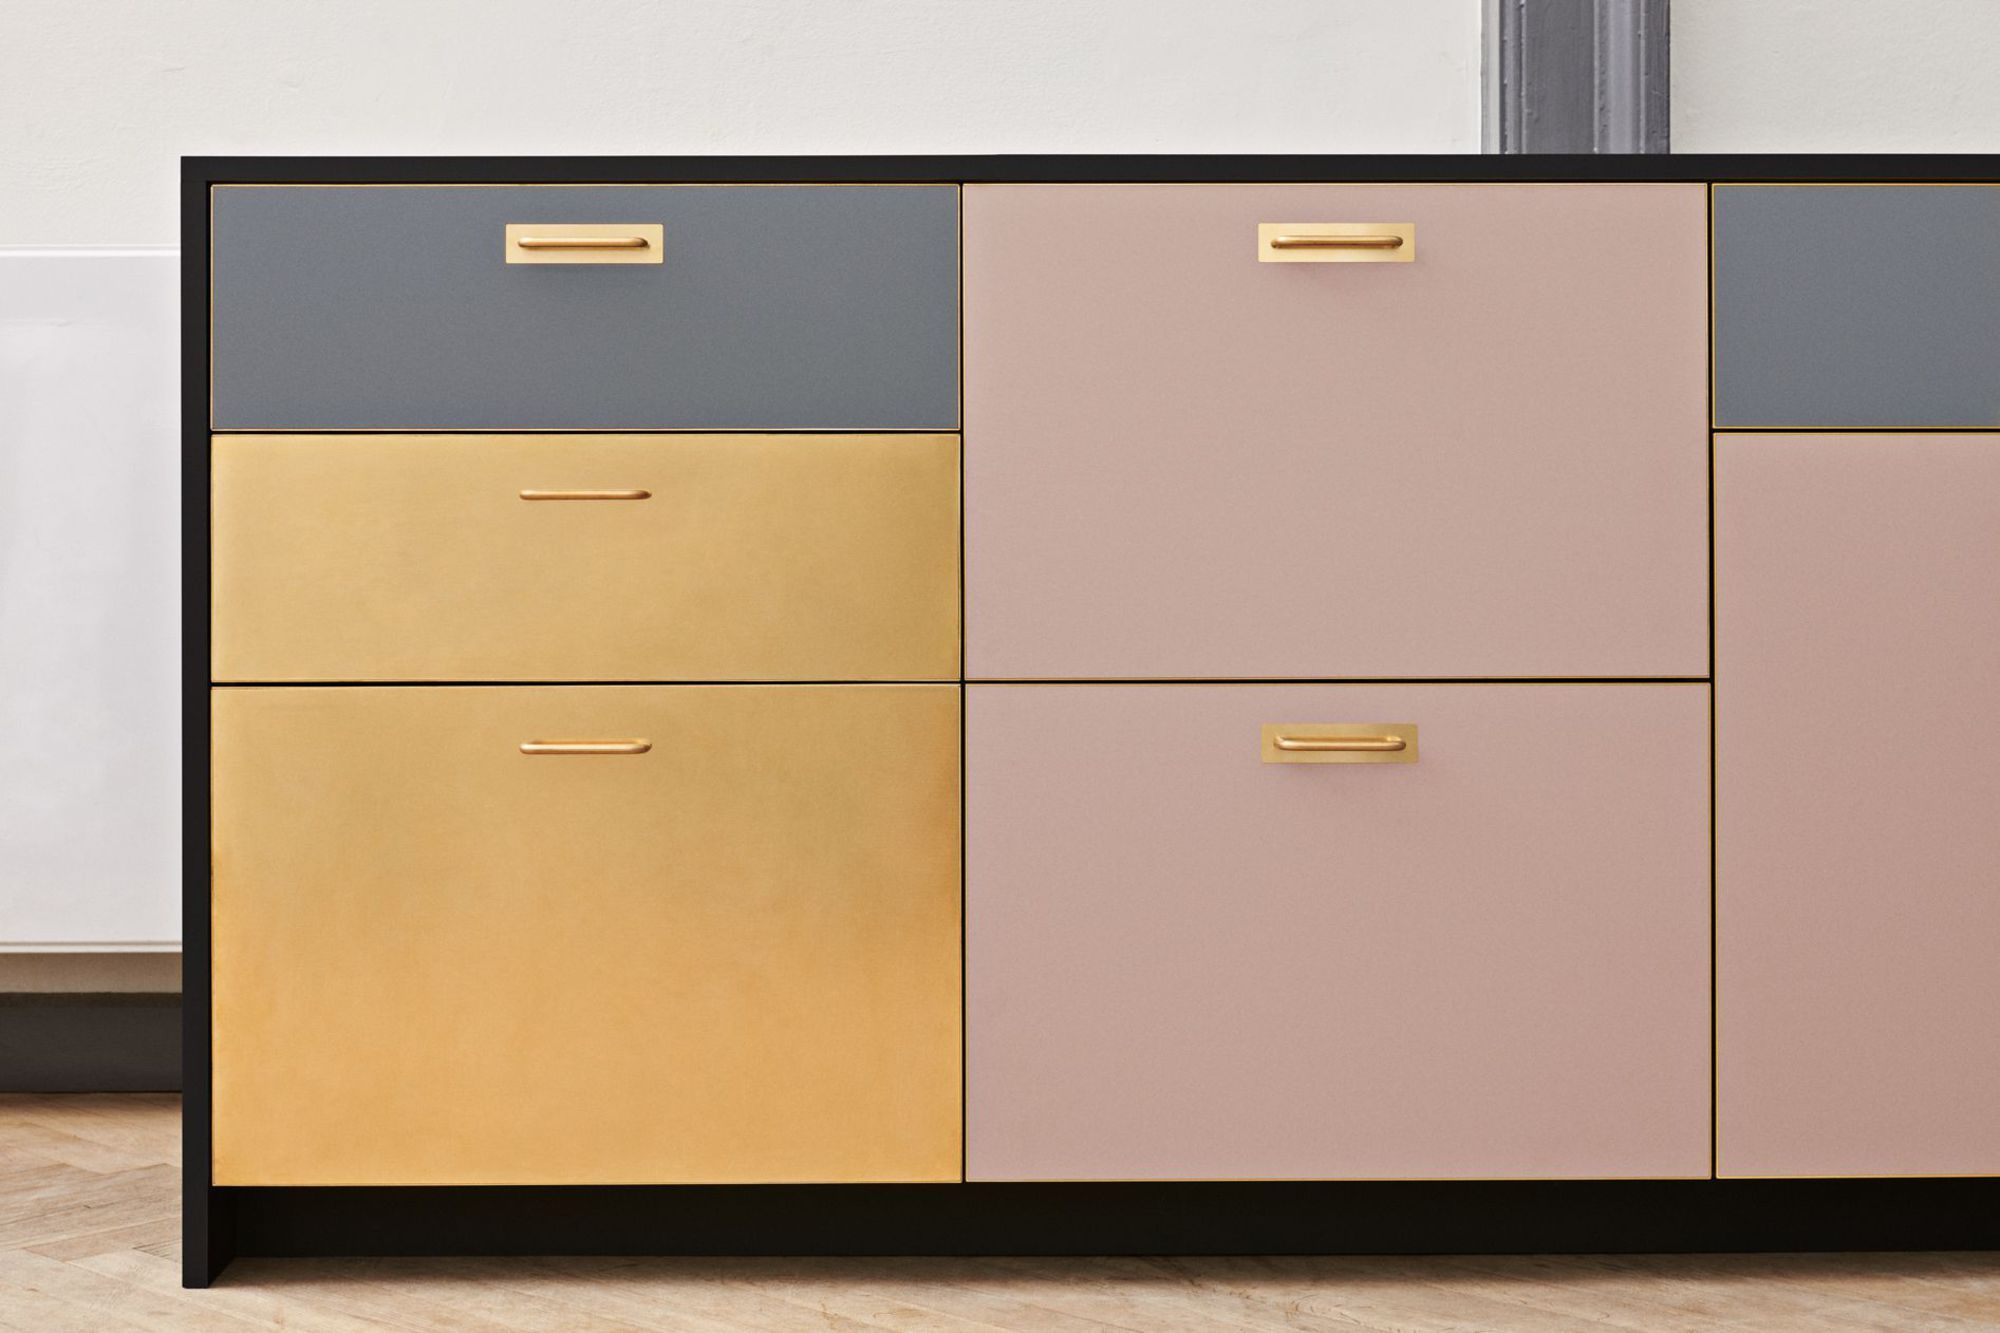 Cuisine ikea relooker et personnaliser ses meubles avec - Relooker ses meubles de cuisine ...